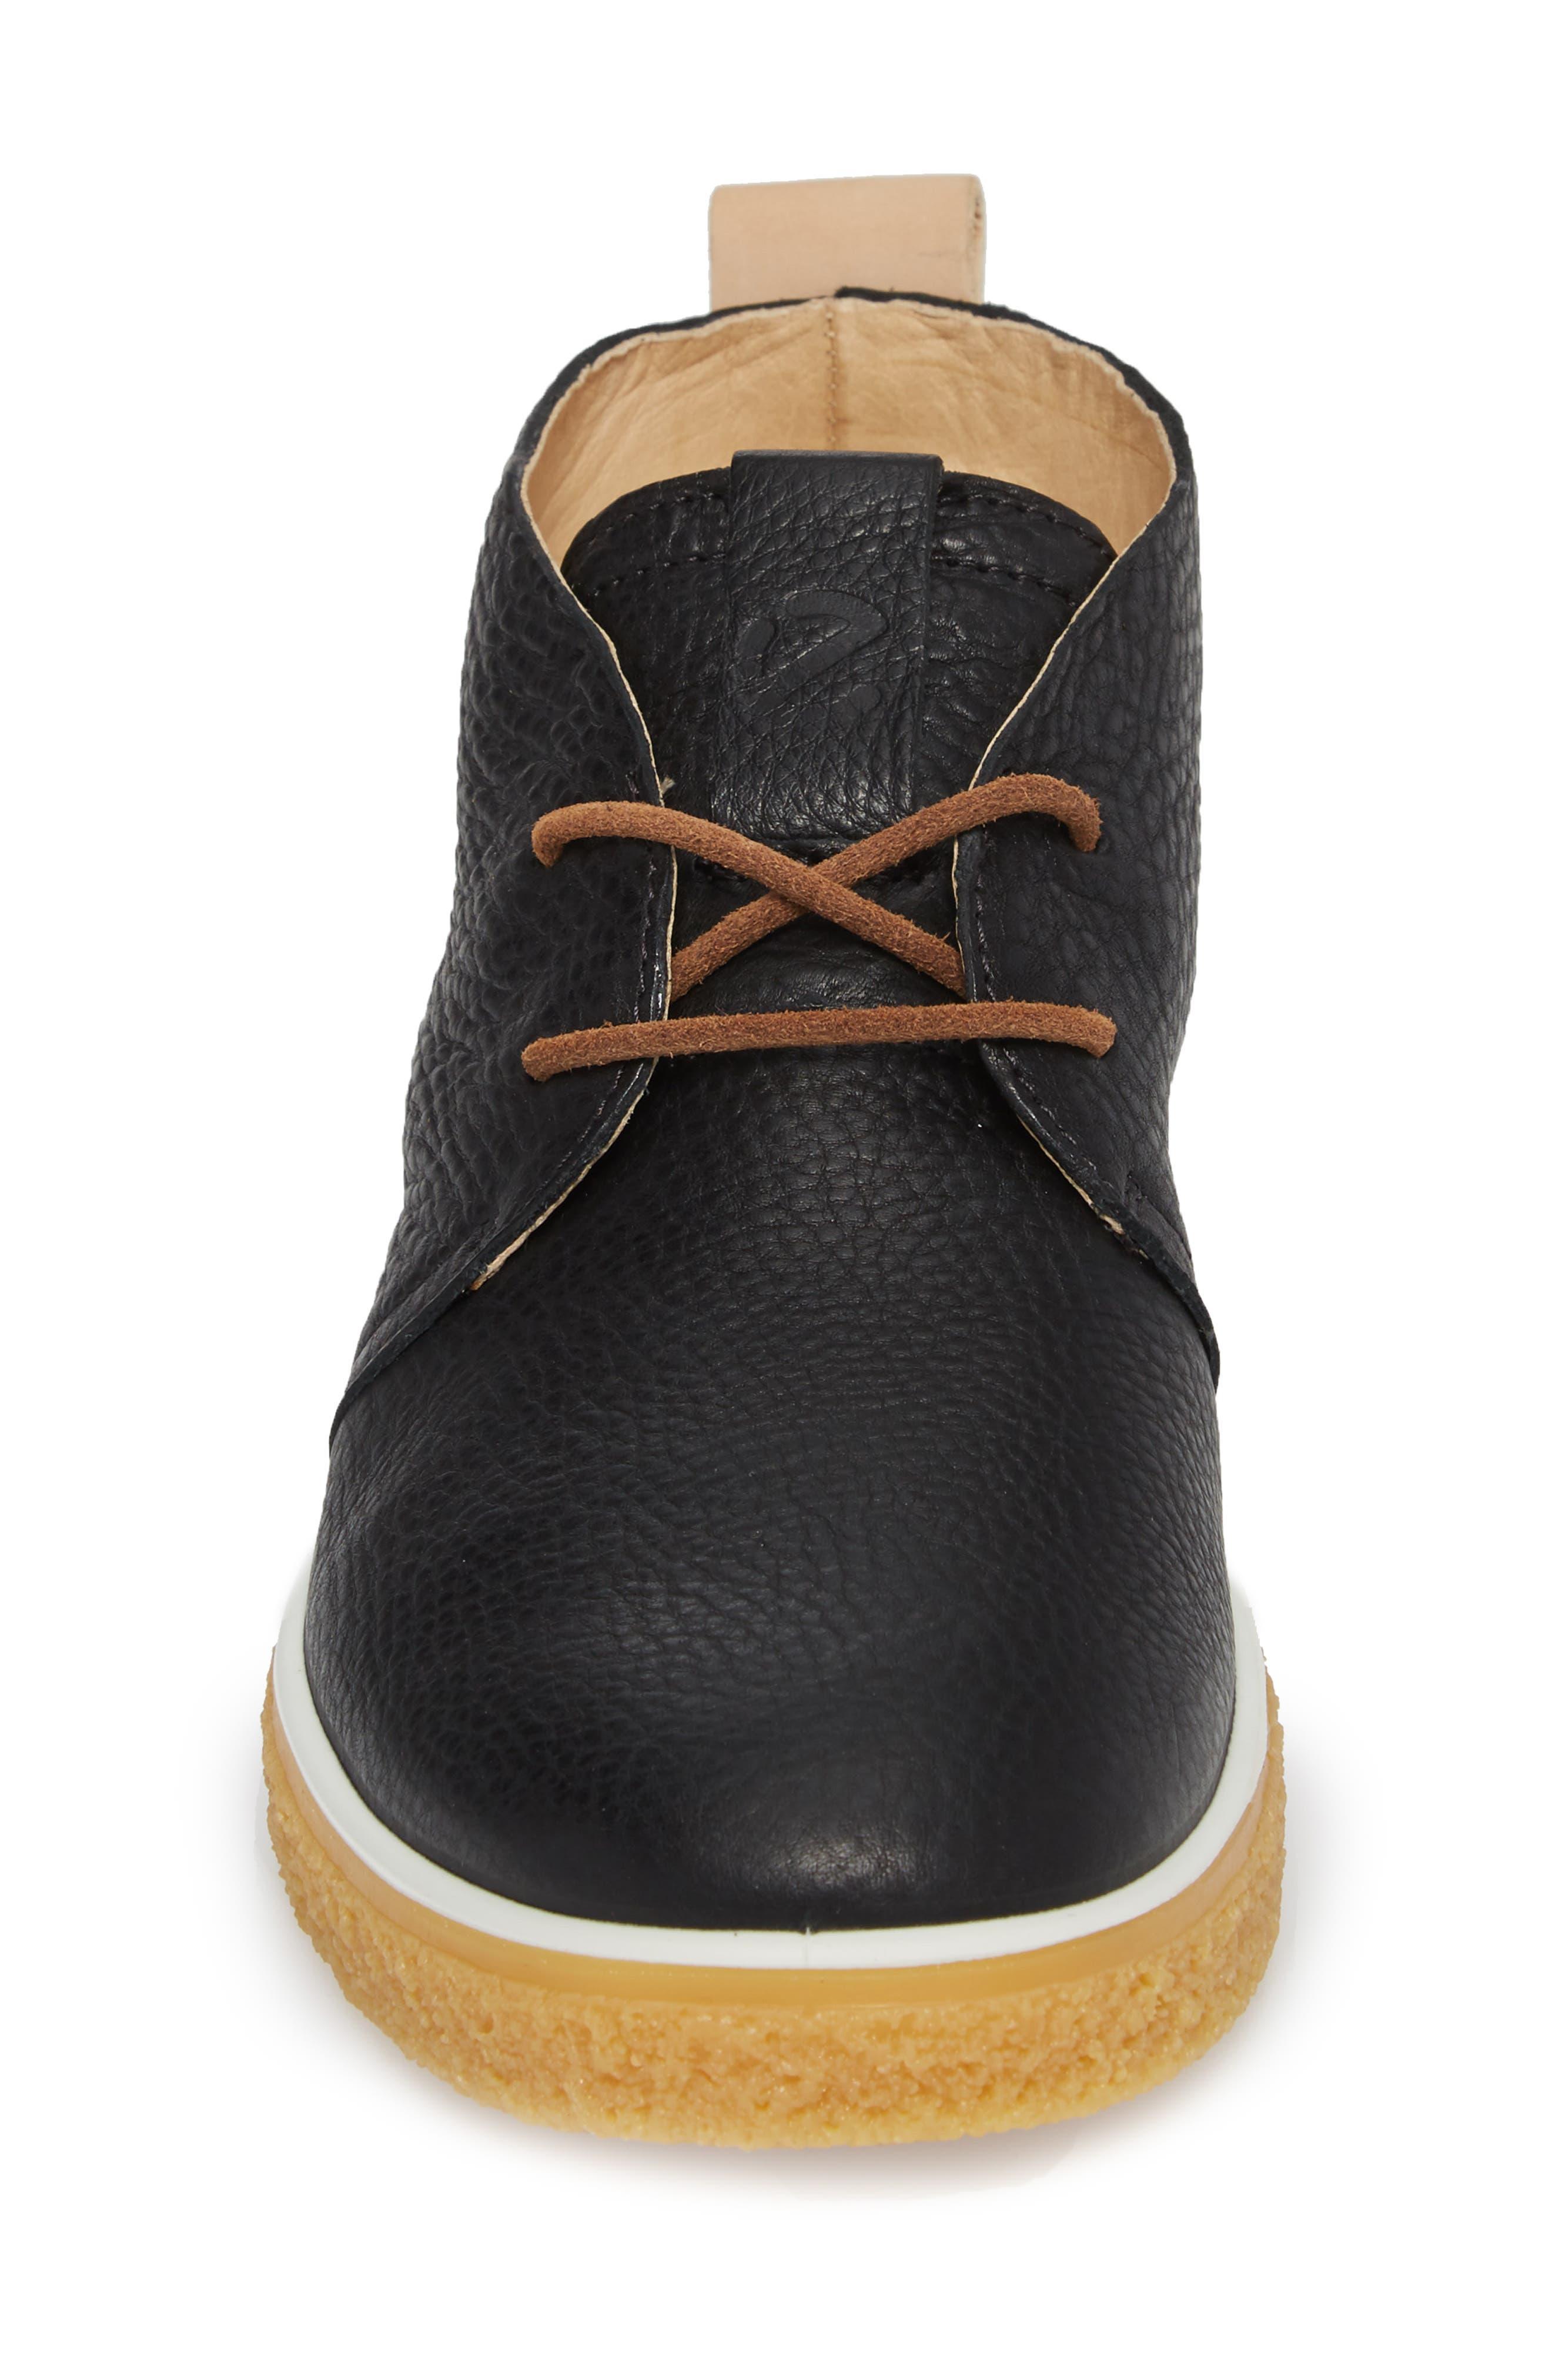 Crepetray Chukka Boot,                             Alternate thumbnail 4, color,                             Black Powder Leather